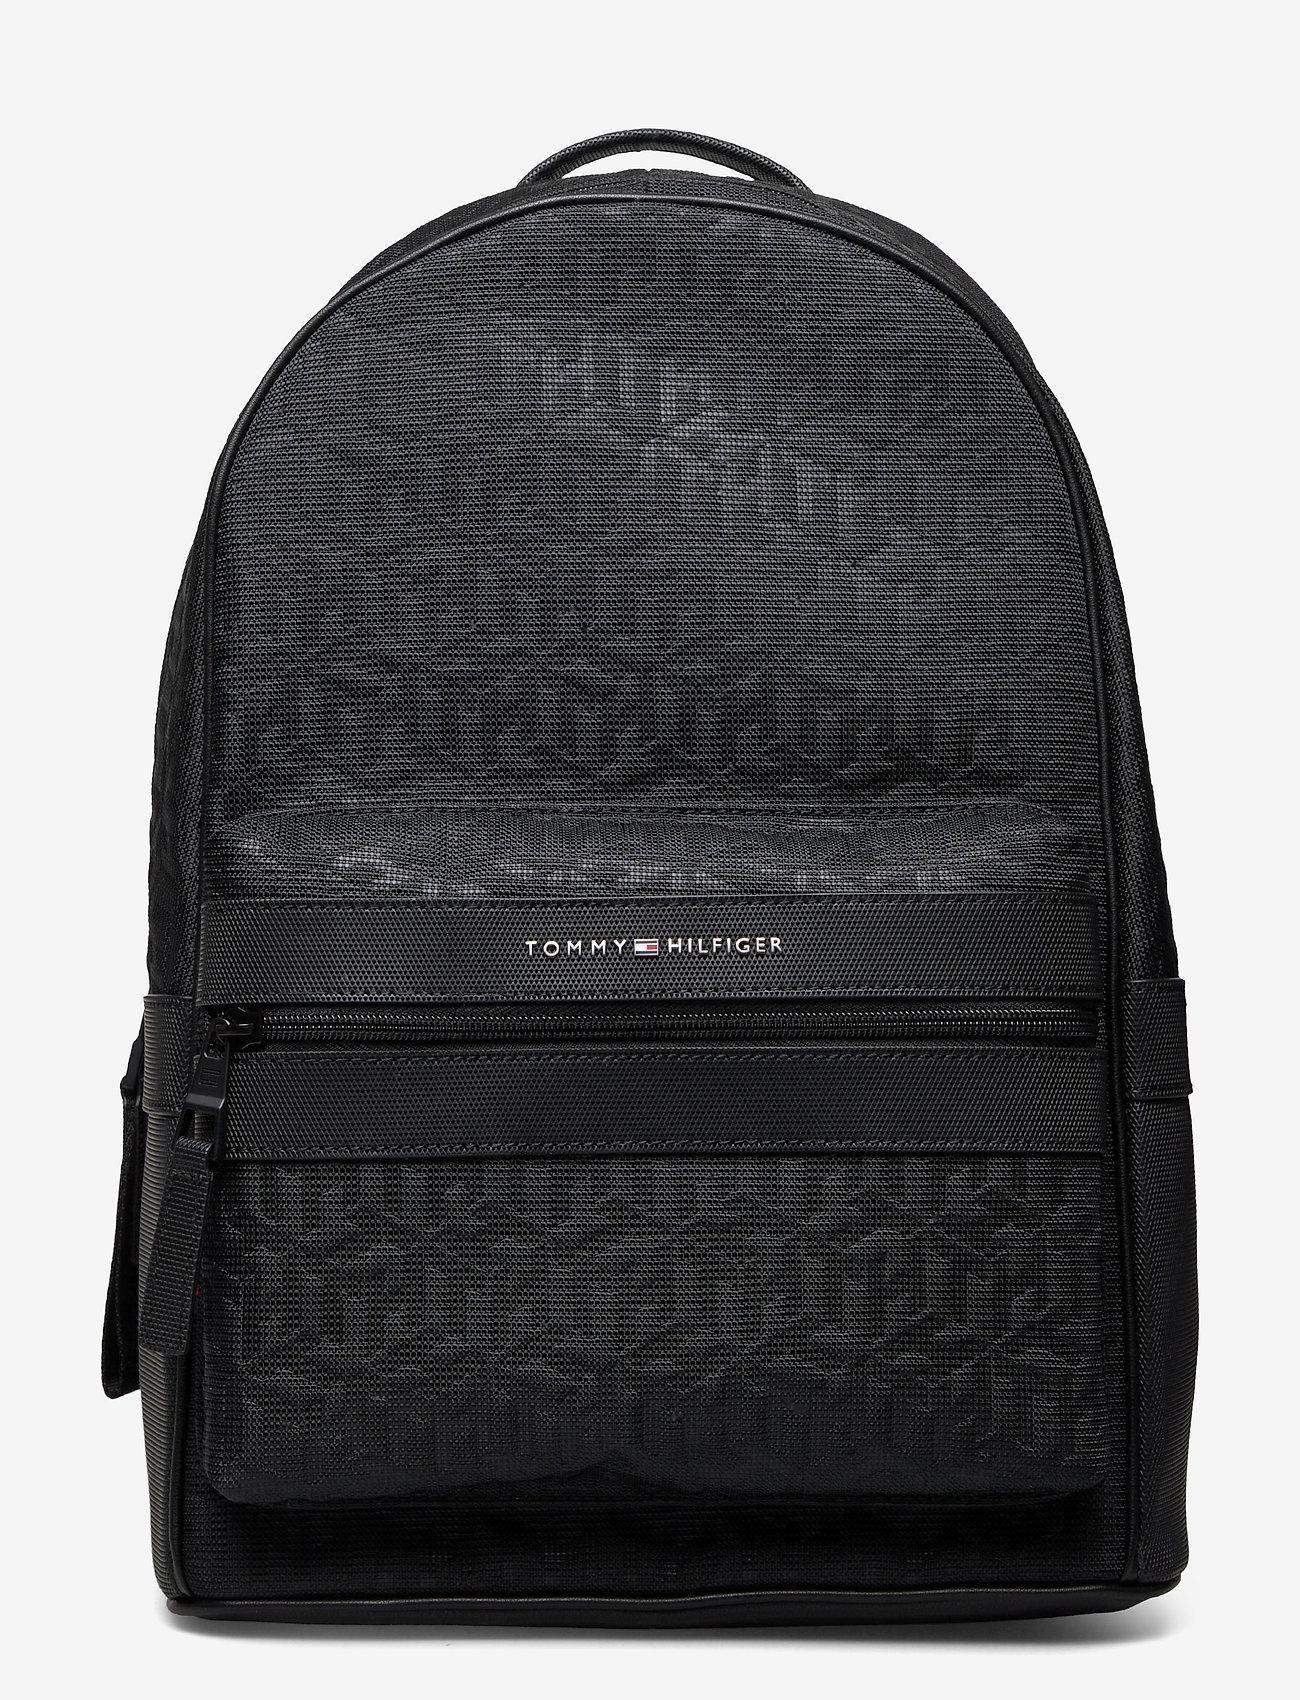 Tommy Hilfiger - ELEVATED NYLON BACKPACK MONO - bags - black monogram - 0